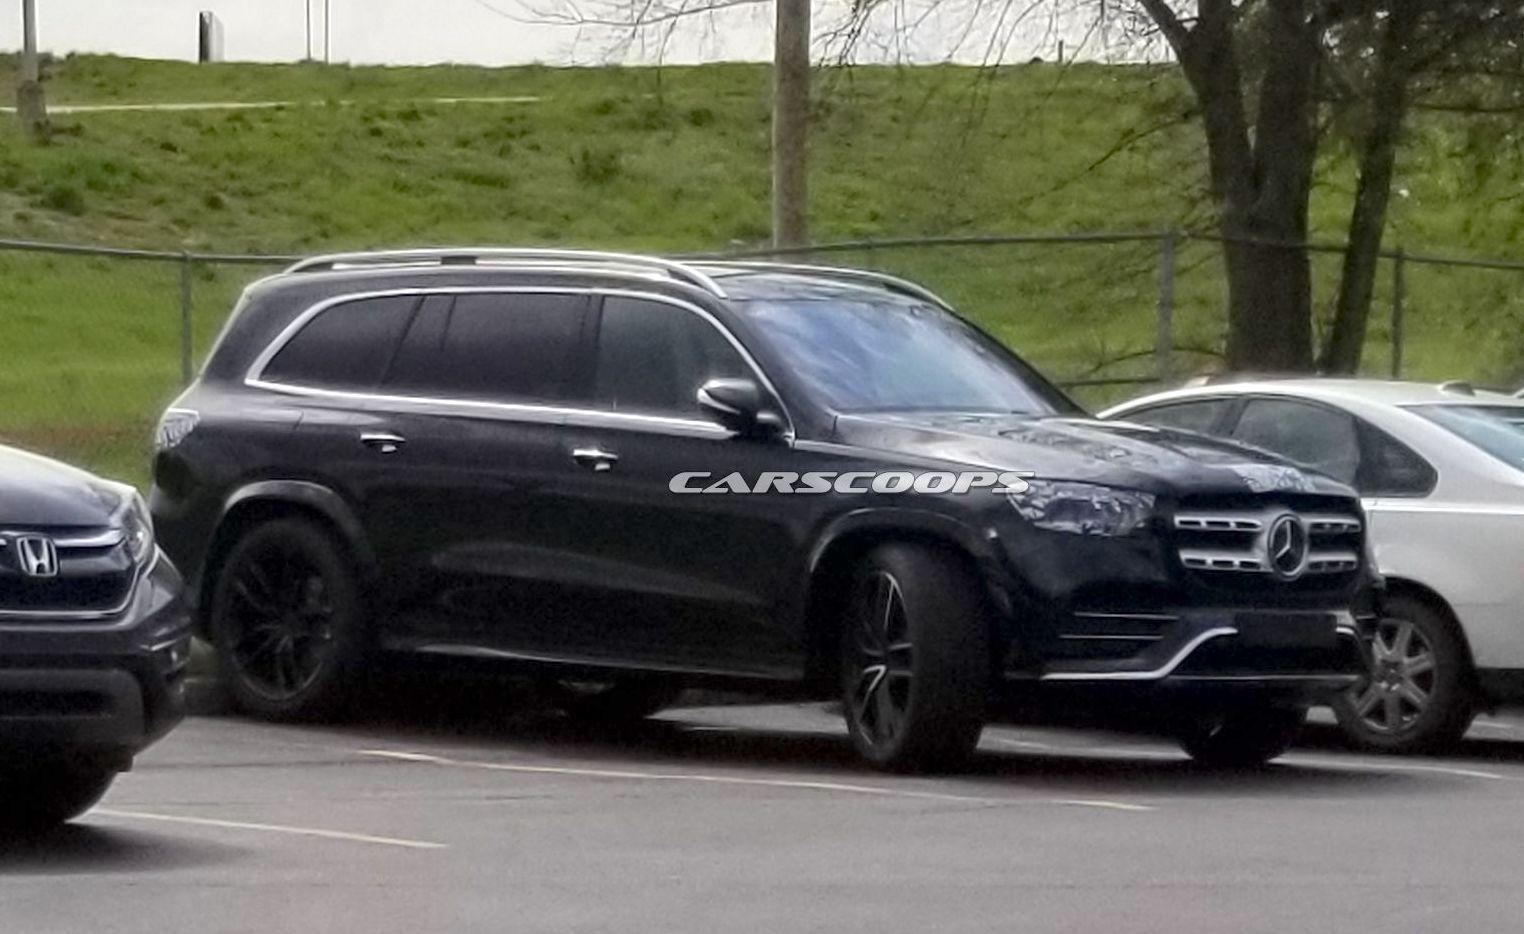 Nuova Mercedes GLS 2020, foto spia